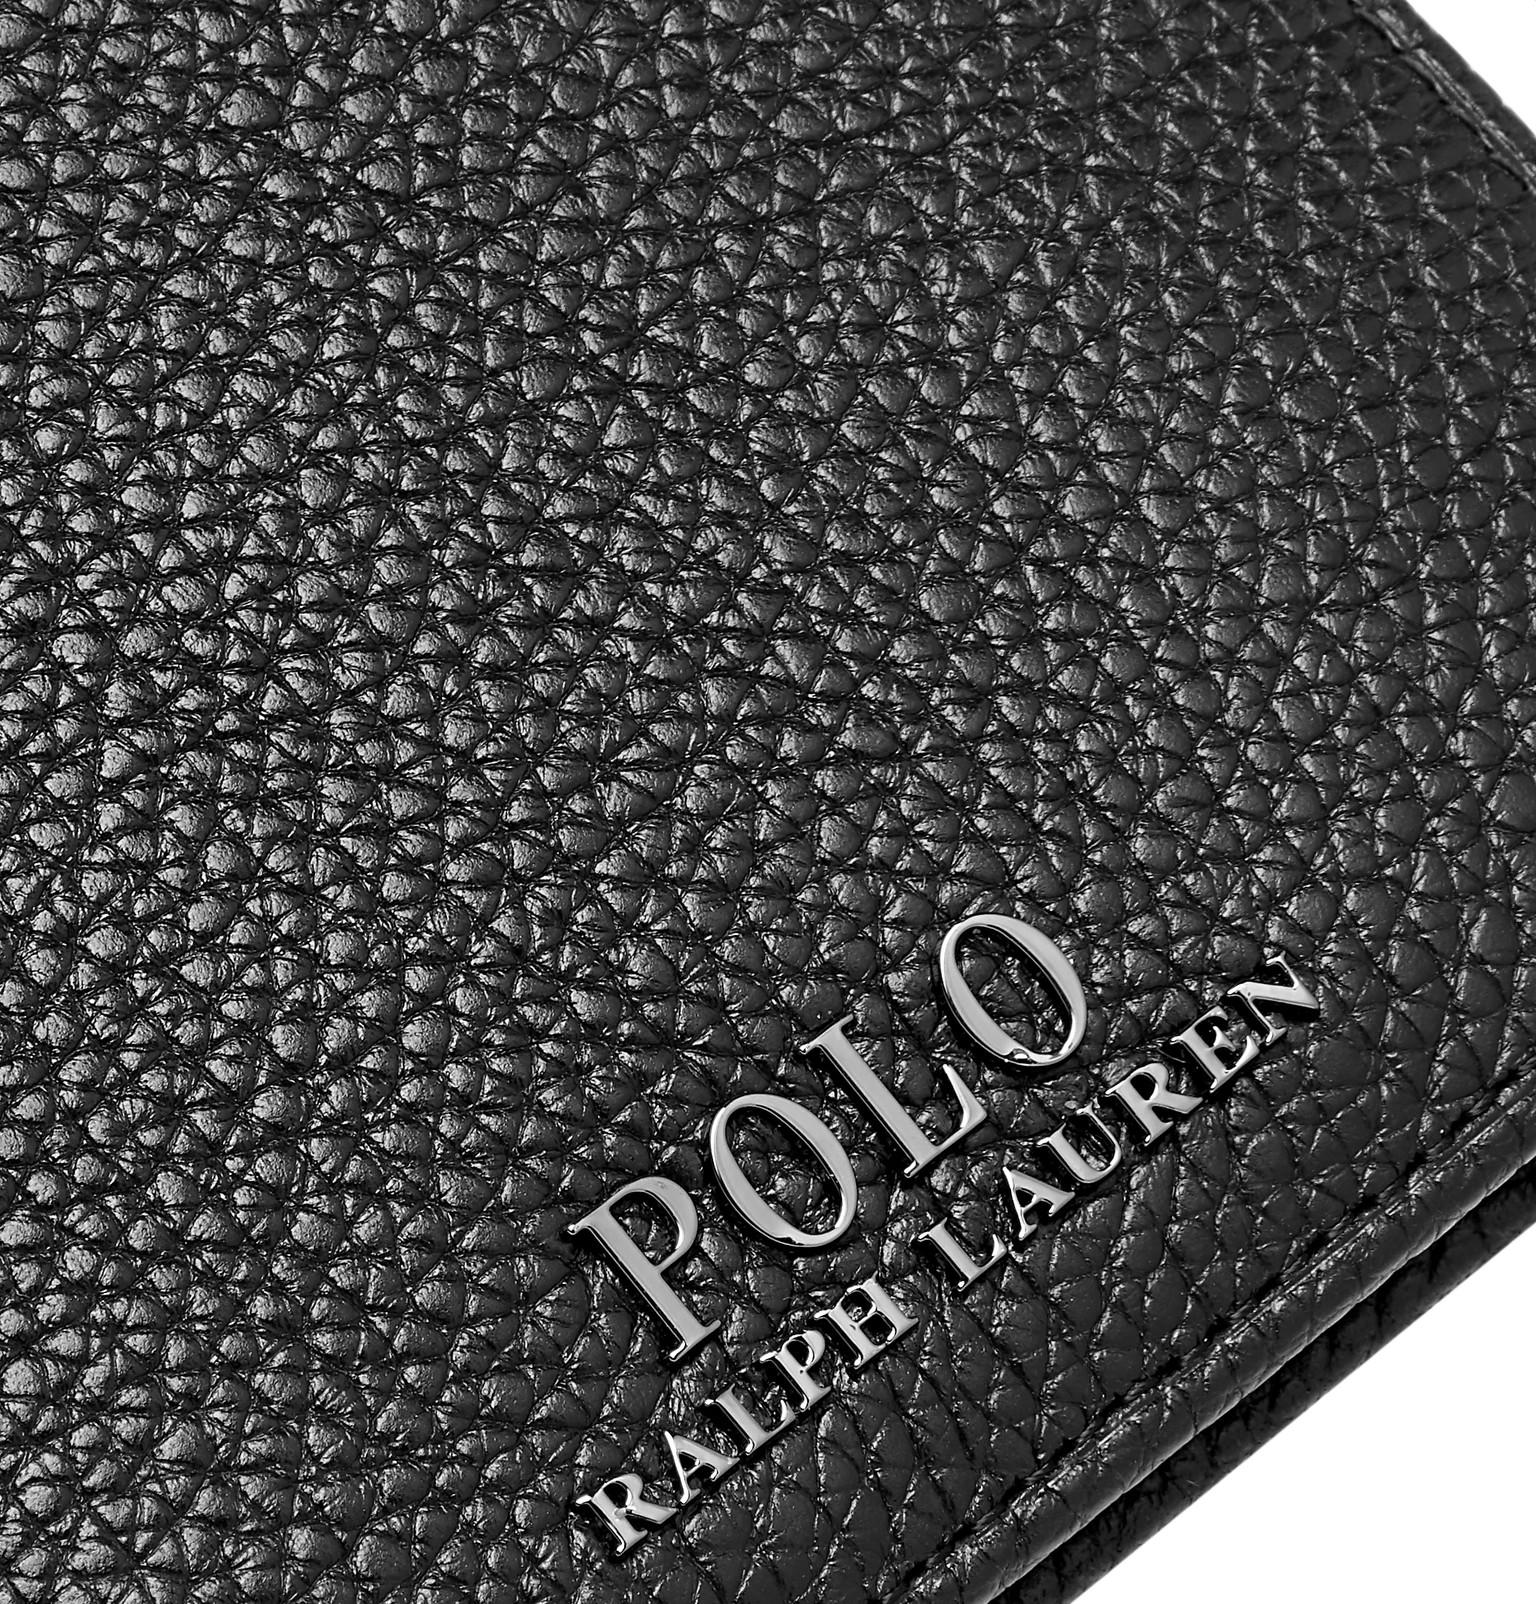 7d323ca7bcc2 Polo Ralph Lauren - Pebble-Grain Leather Billfold Wallet